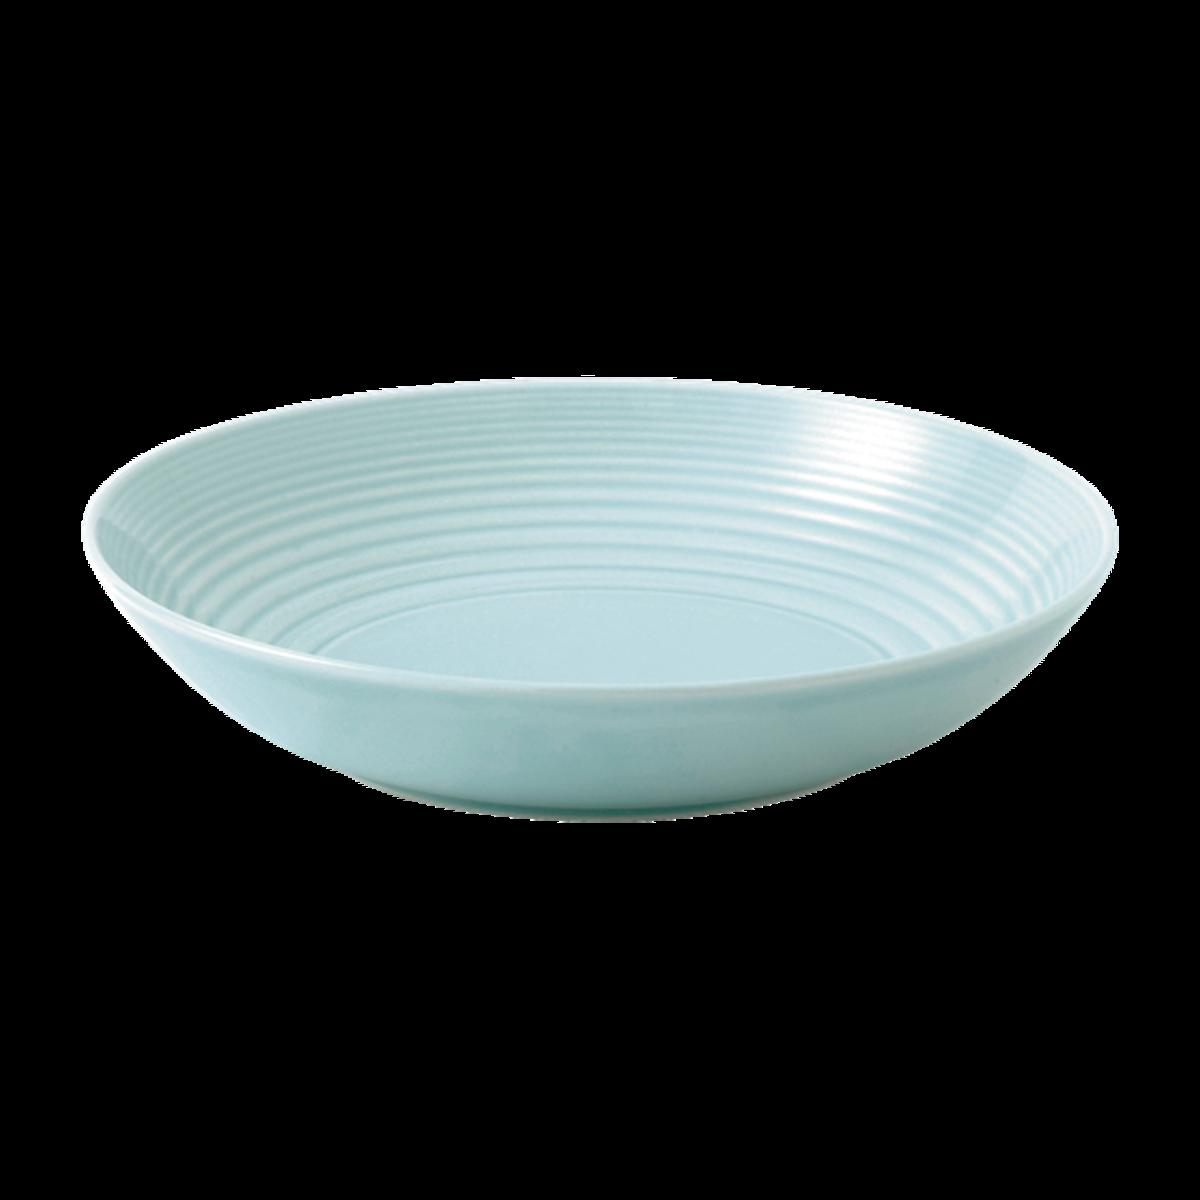 Royal Doulton Gordon Ramsay Maze Pasta Bowls, Blue, set of 4